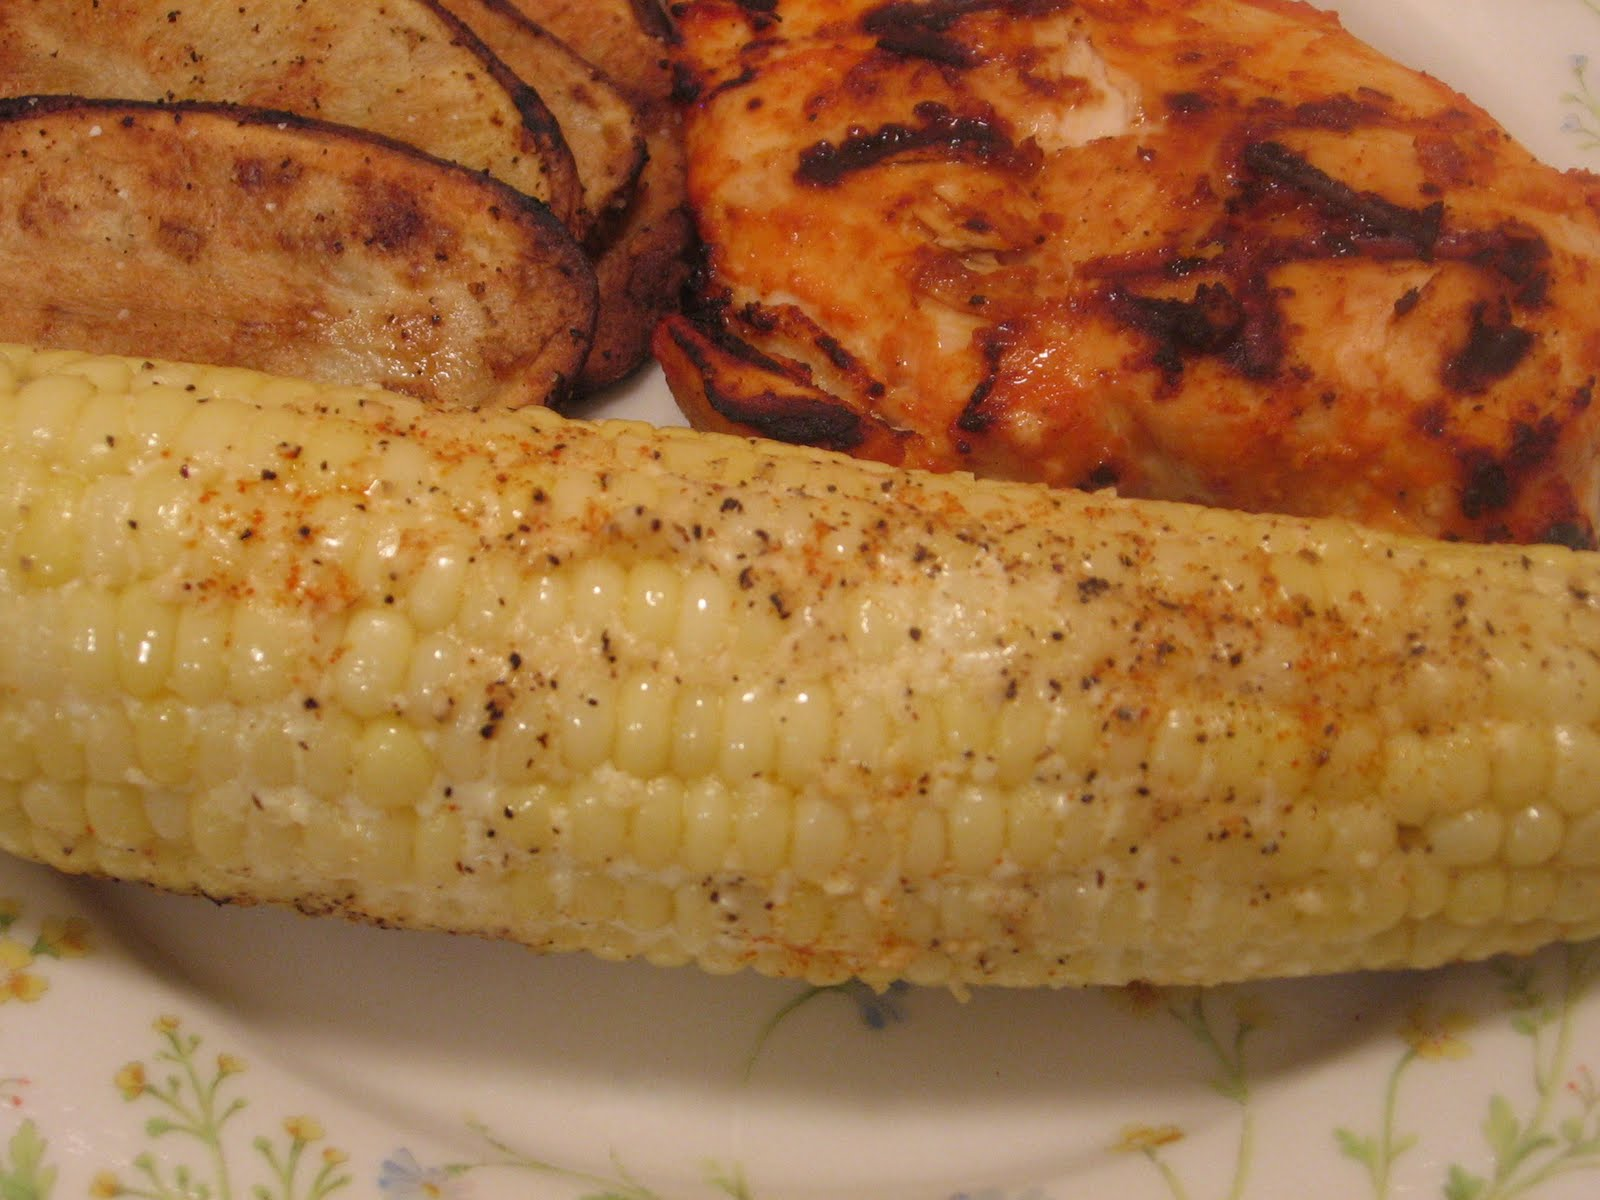 Jenn's Food Journey: Grilled Parmesan Corn on the Cob